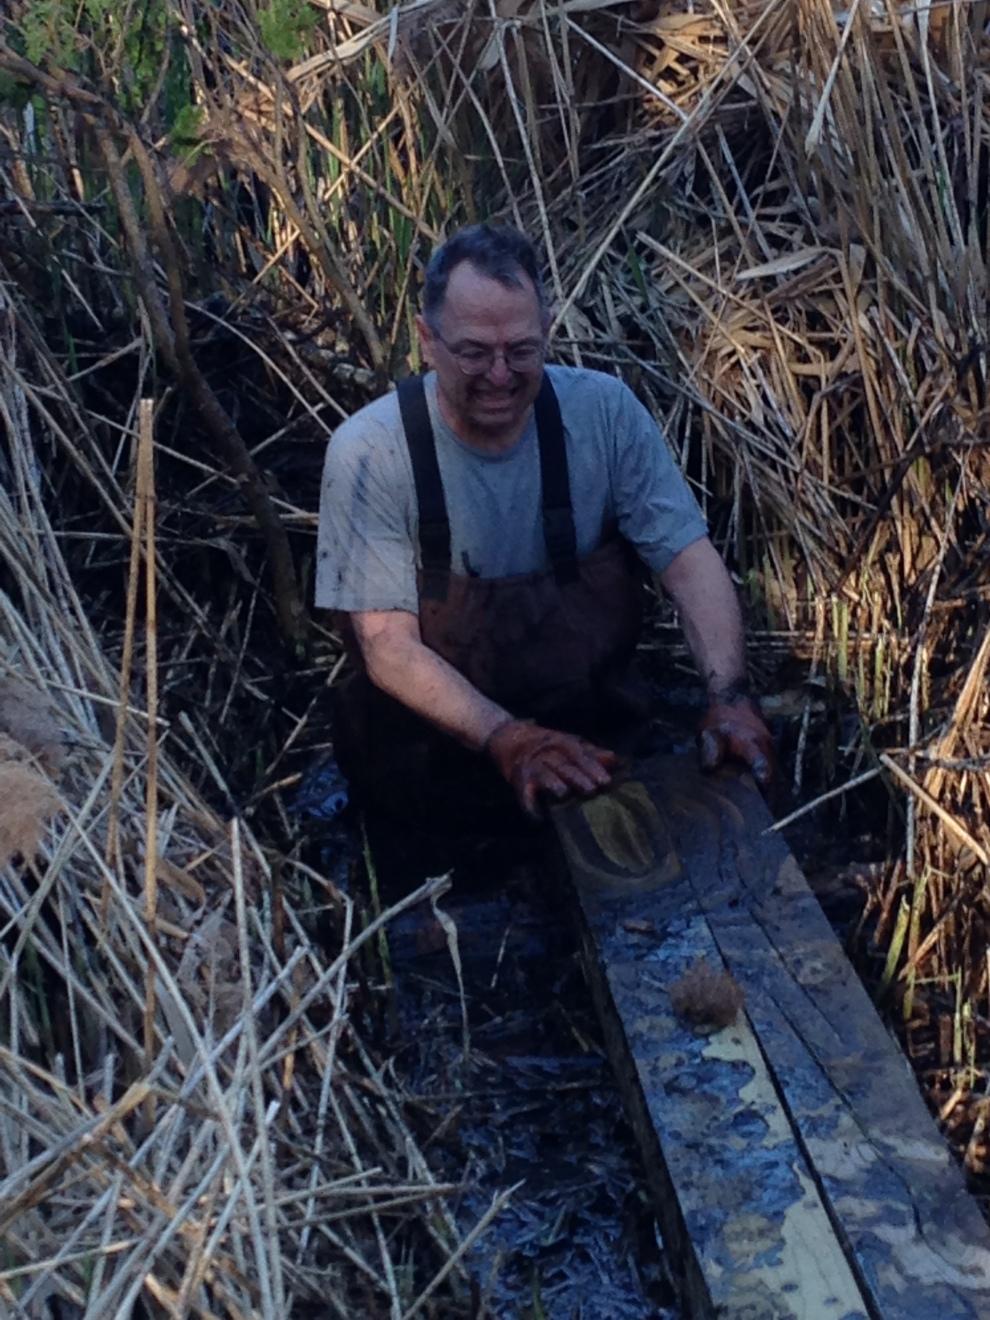 gil swamp cu